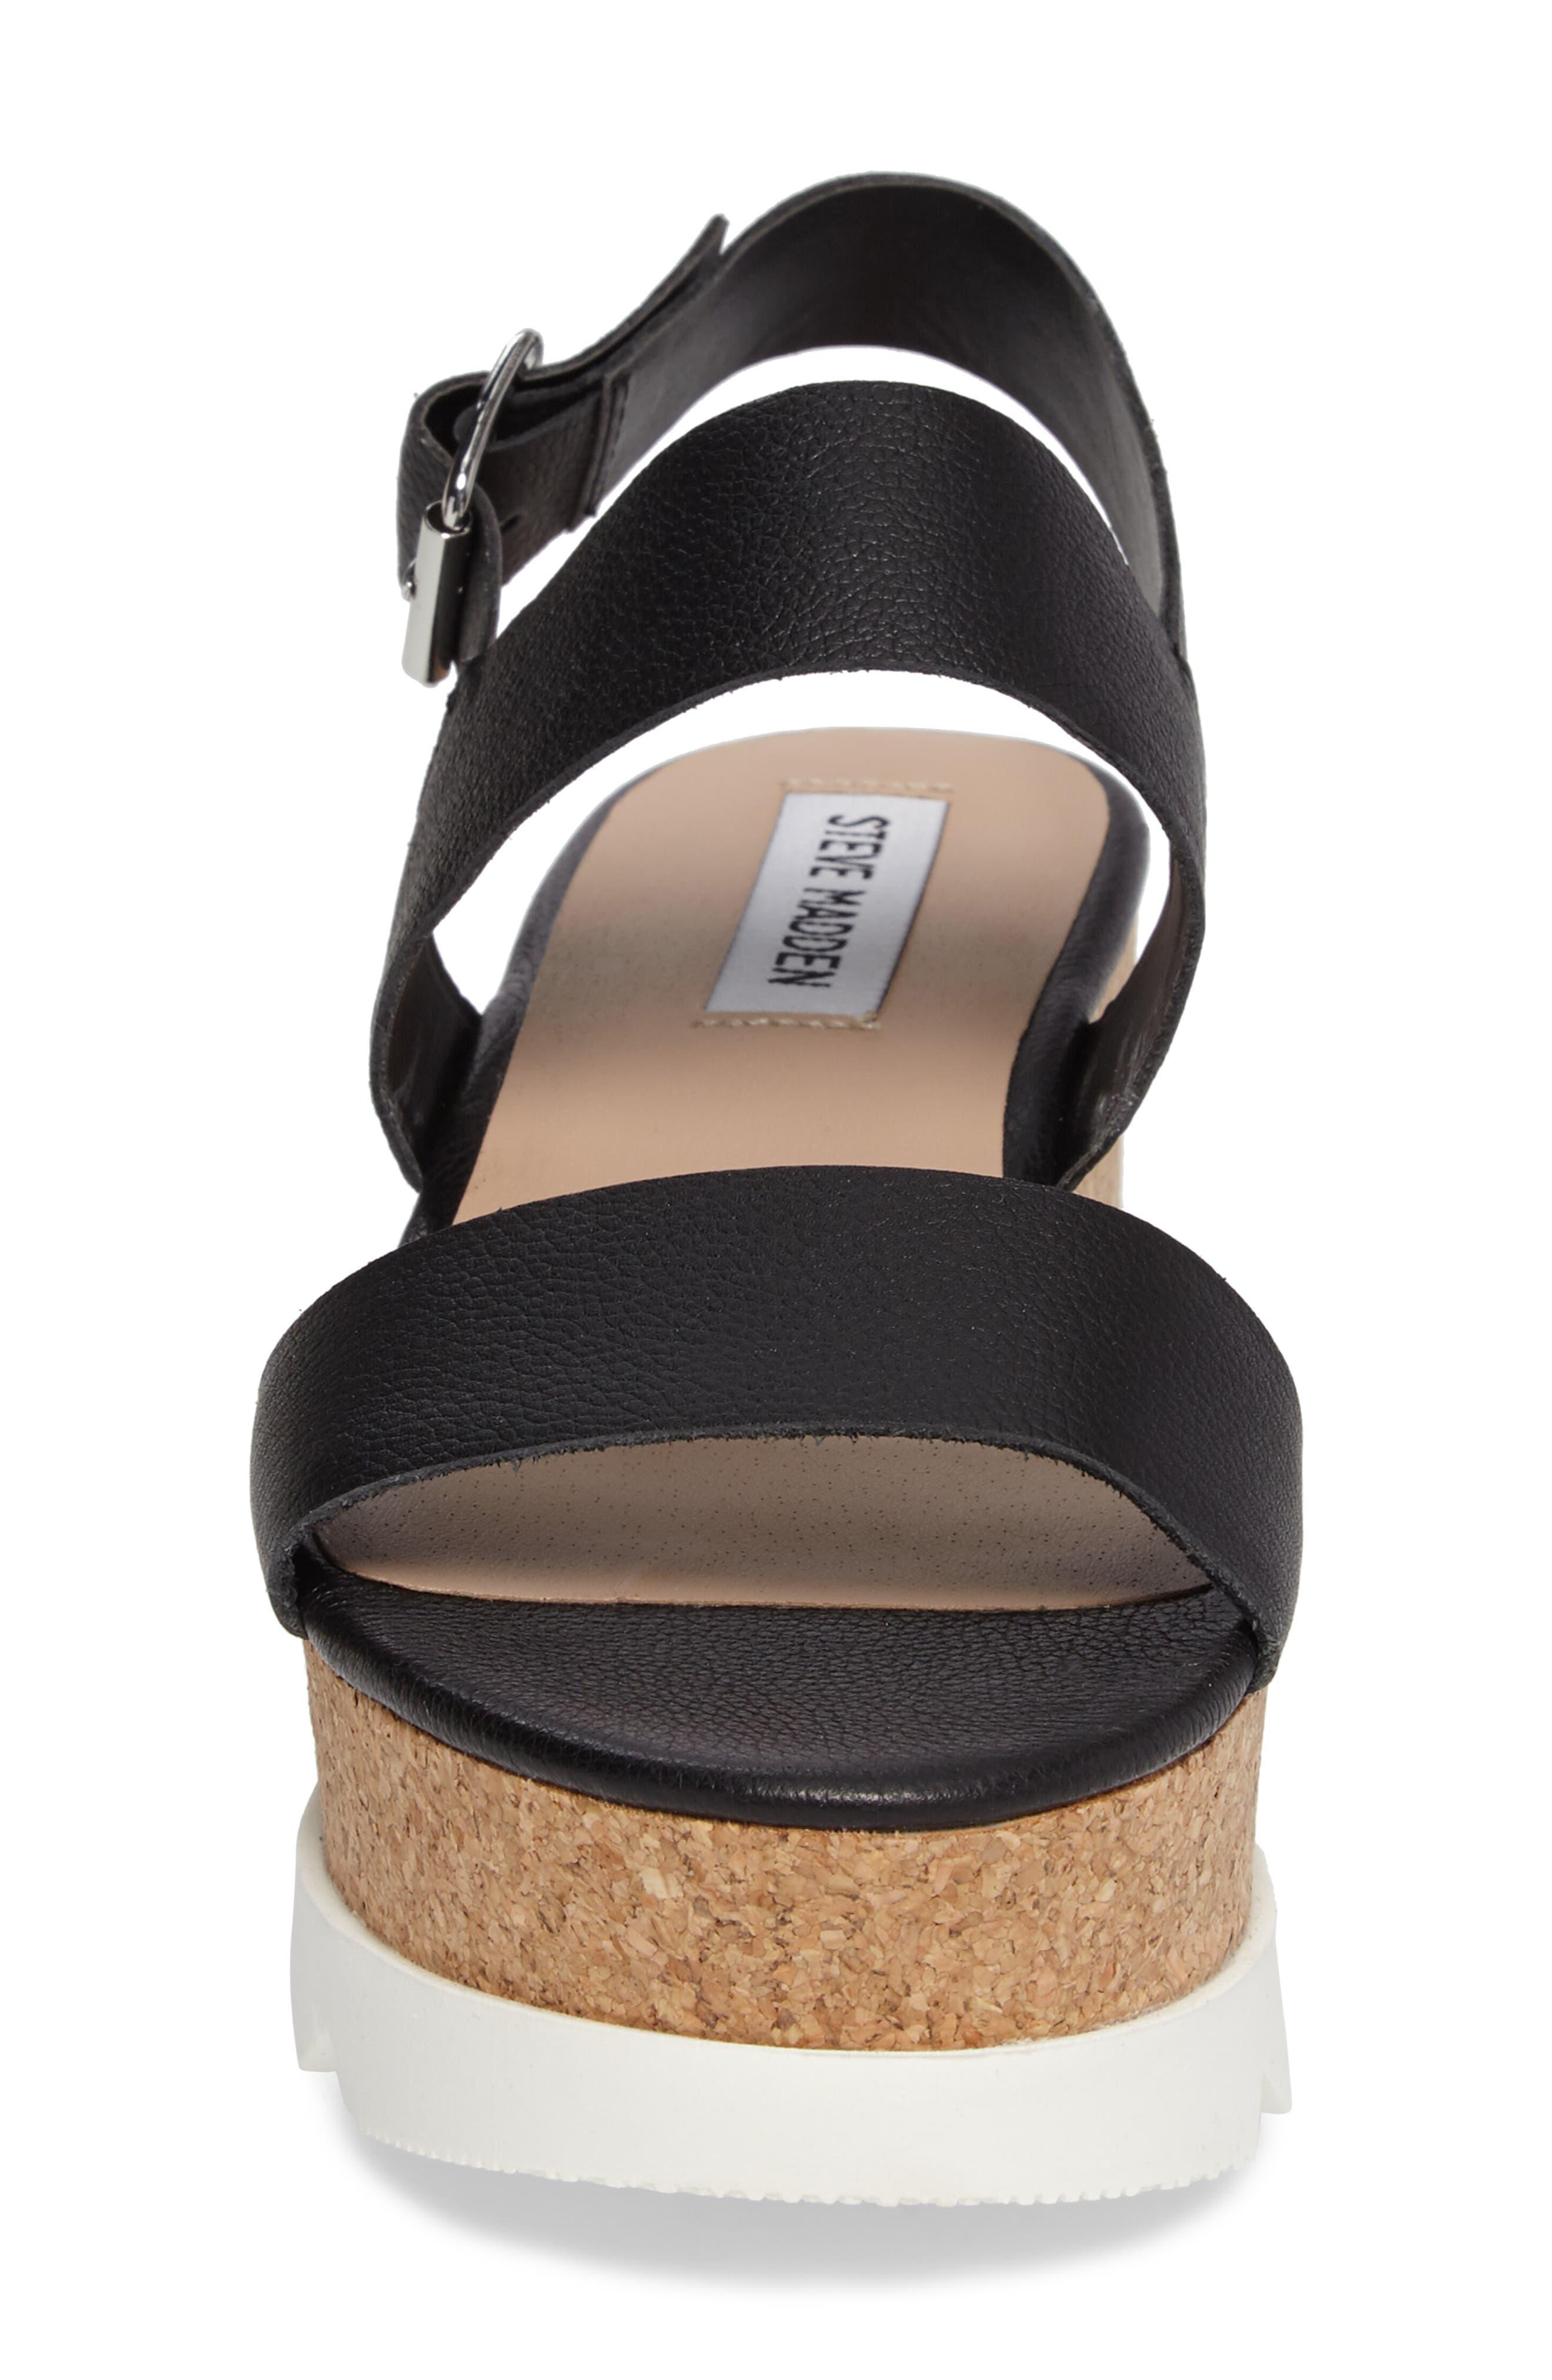 Krista Wedge Sandal,                             Alternate thumbnail 4, color,                             Black Leather